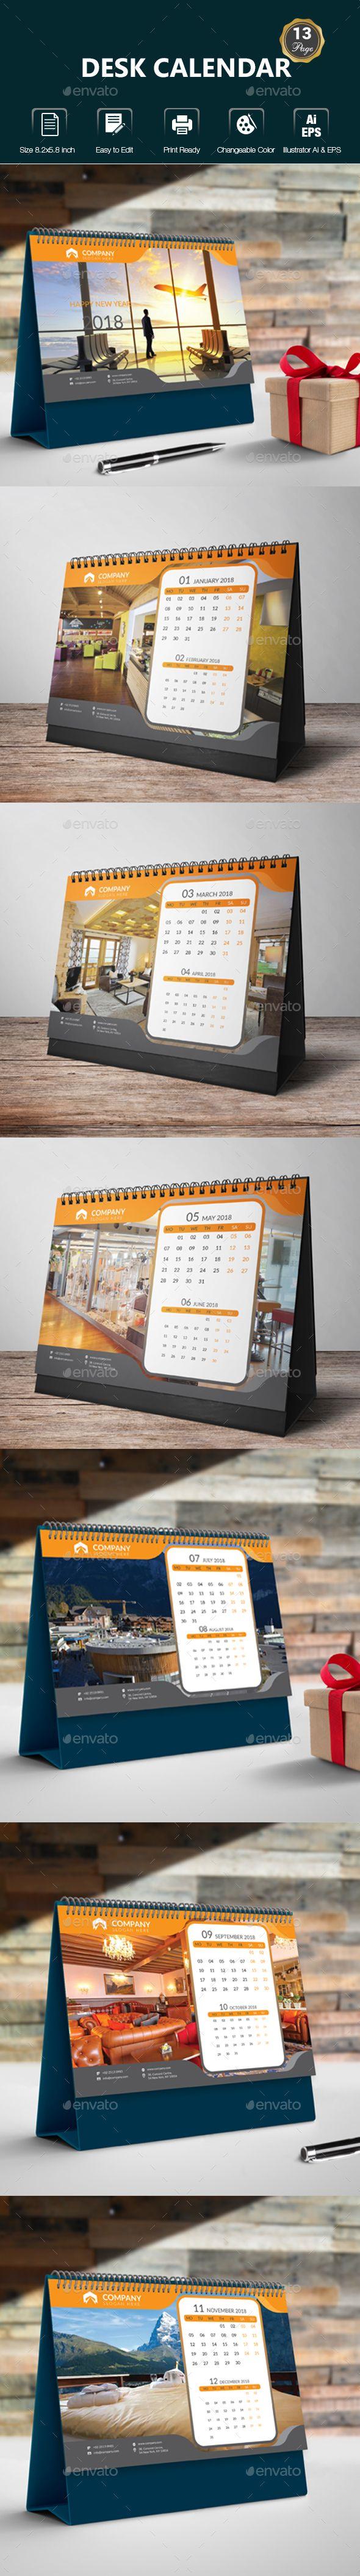 Desk Calendar Template Vector EPS, AI Illustrator